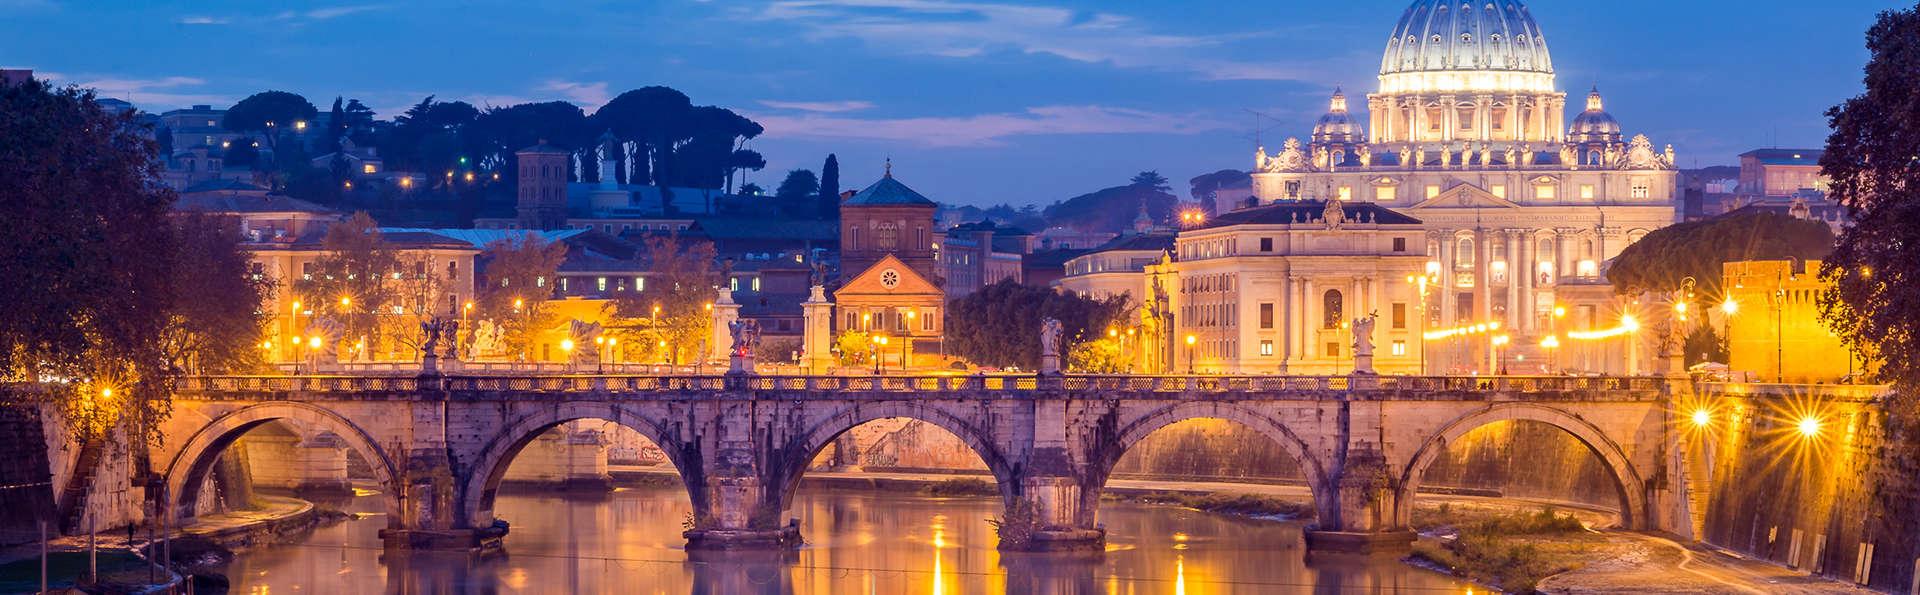 Venetia Palace Hotel 4 Rome Italie